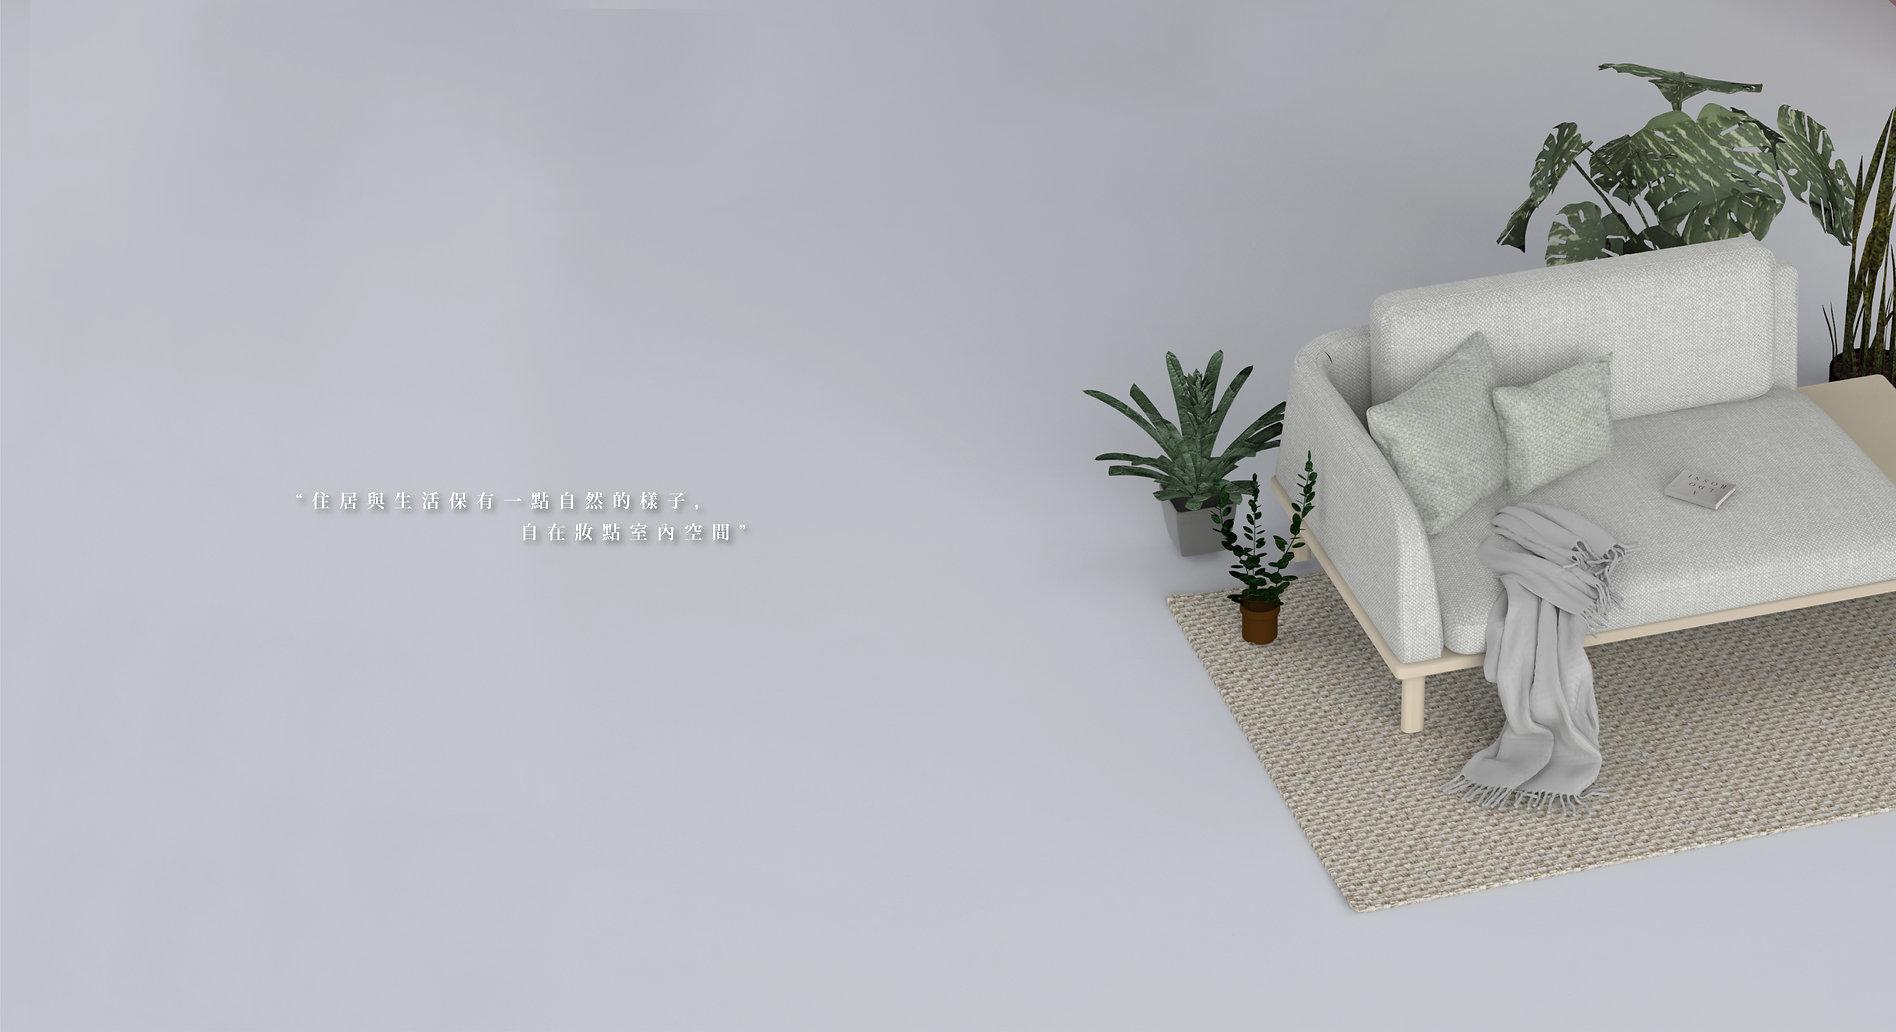 RENDERING2 -單張椅子與植物.9331.jpg